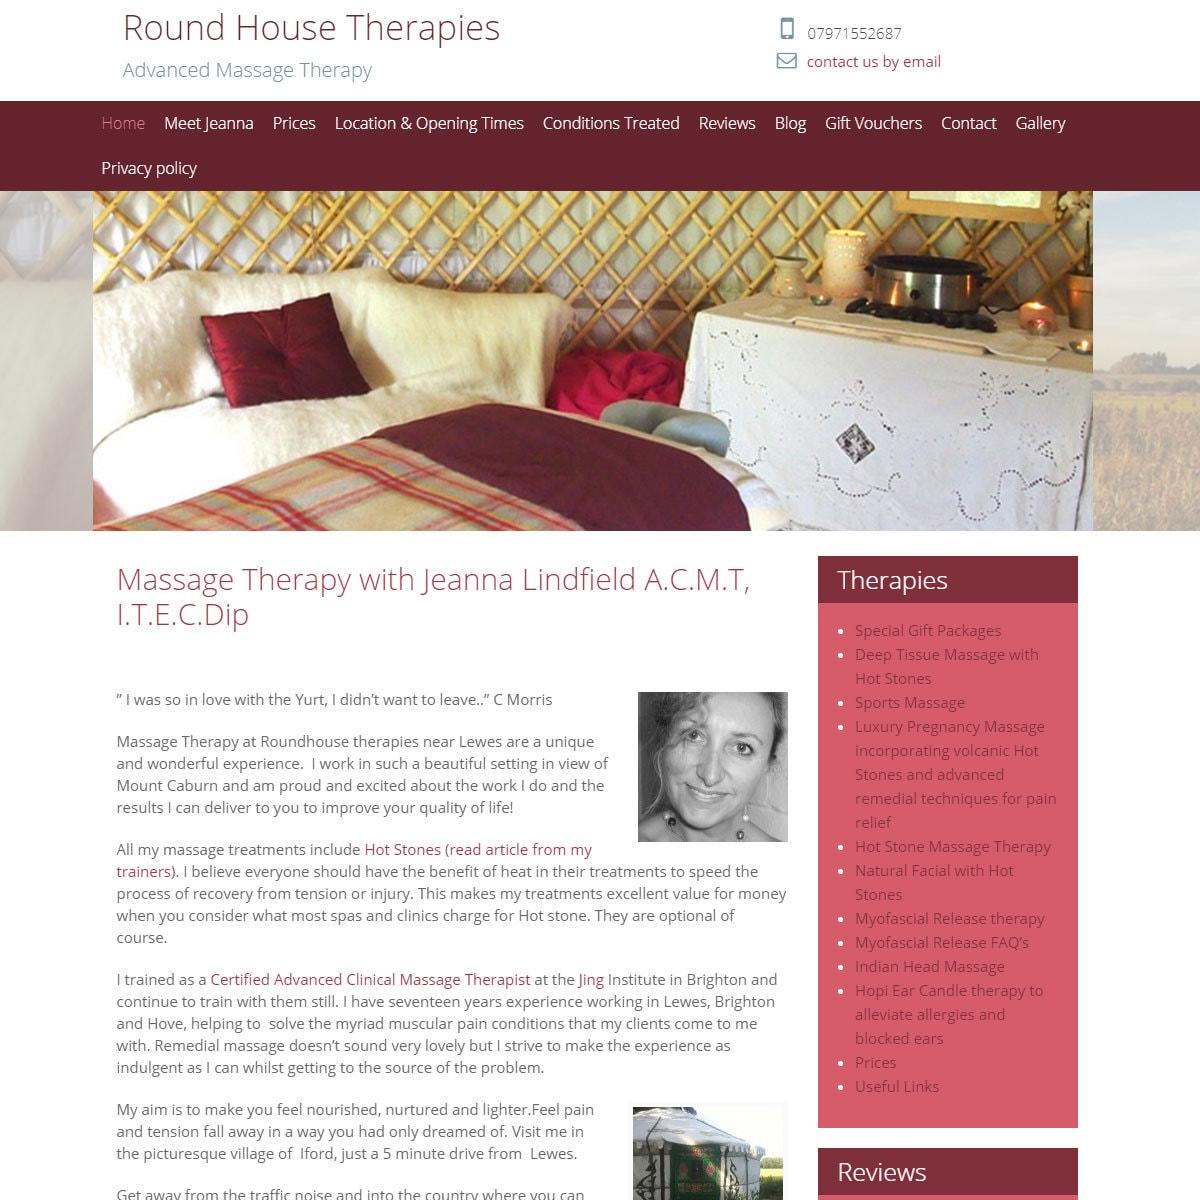 roundhousetherapies